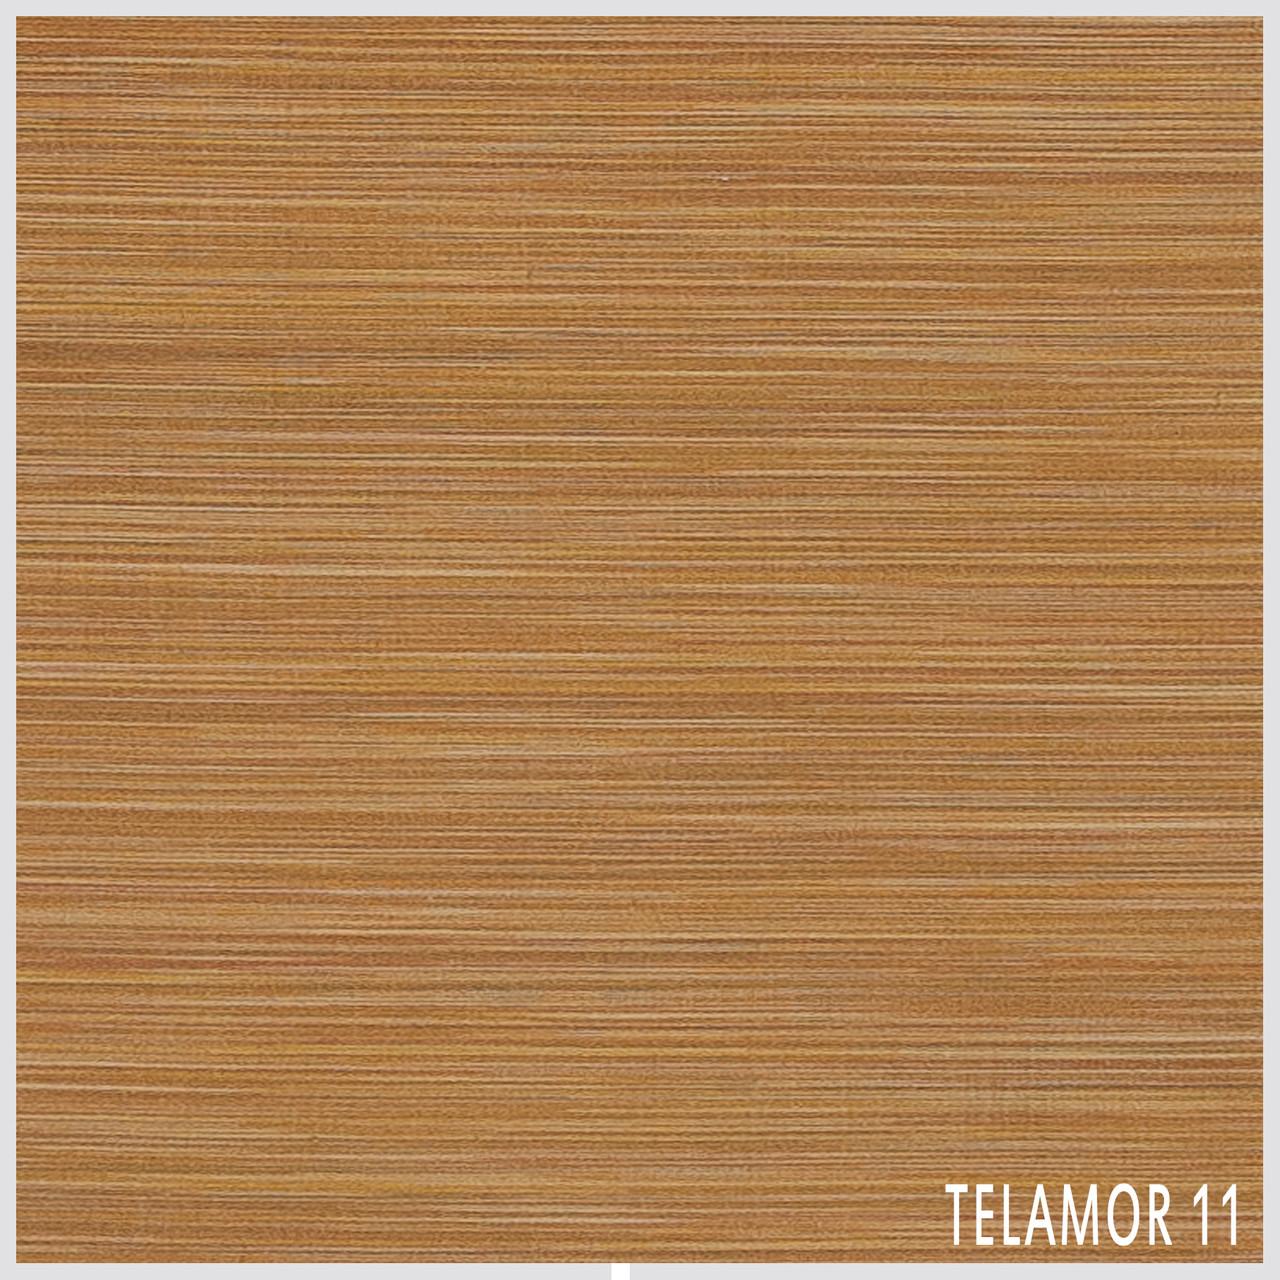 Ткань для штор TELAMOR